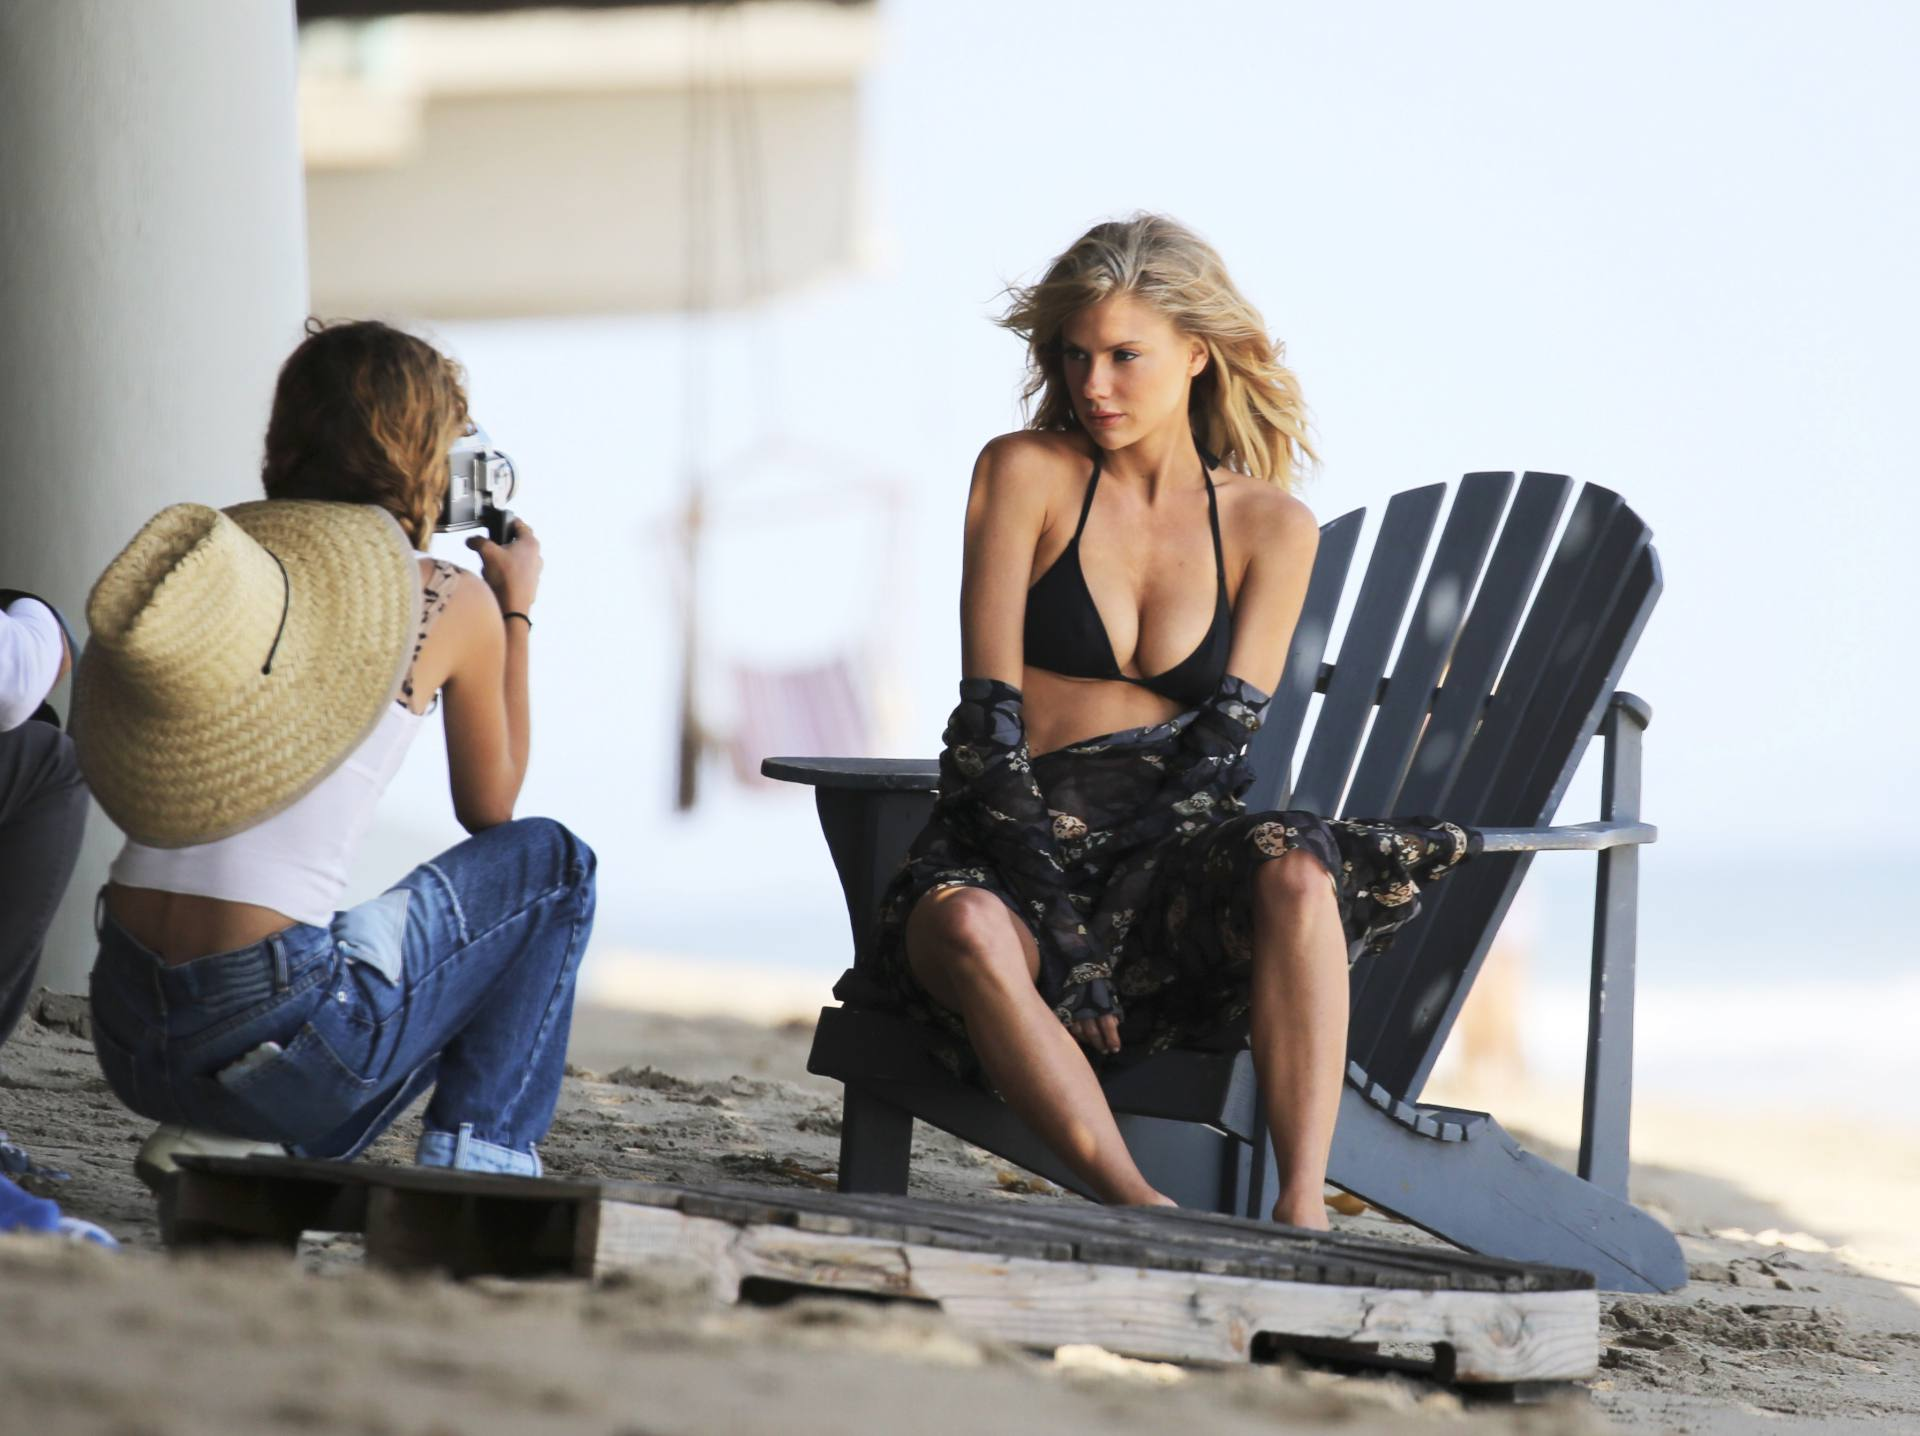 Charlotte Mckinney – Sexy Boobs In Tiny Bikini On The Beach In Los Angeles 0010